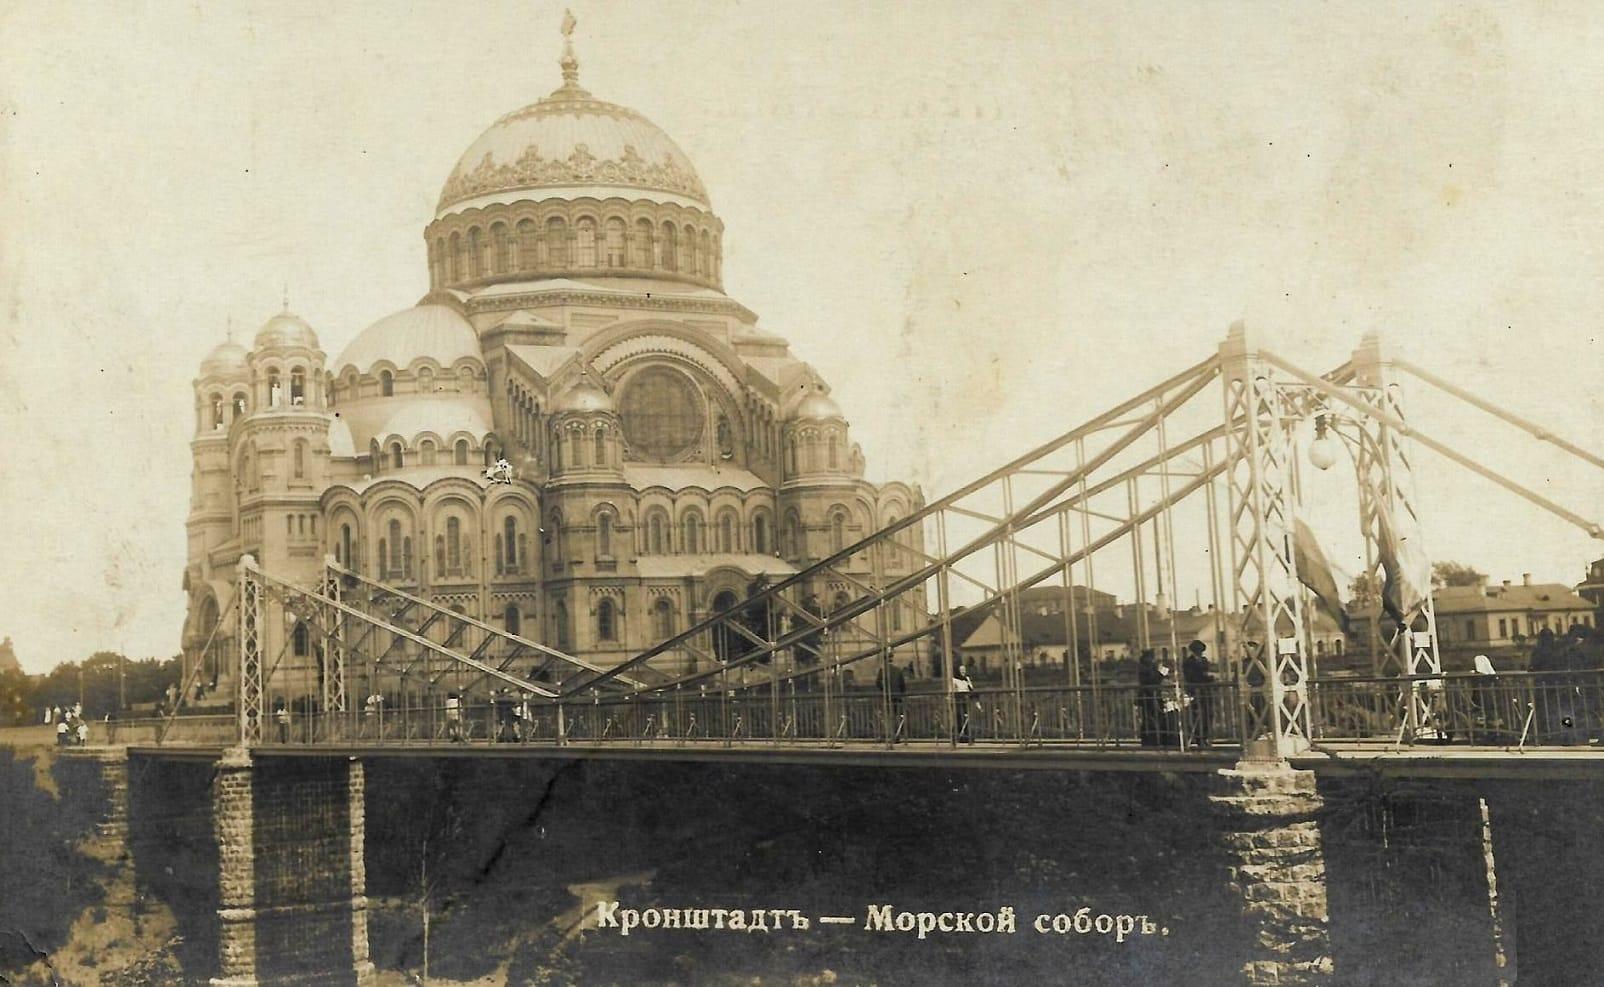 Мост через овраг с видом на Морской собор, Кронштадт 1913-1914 гг